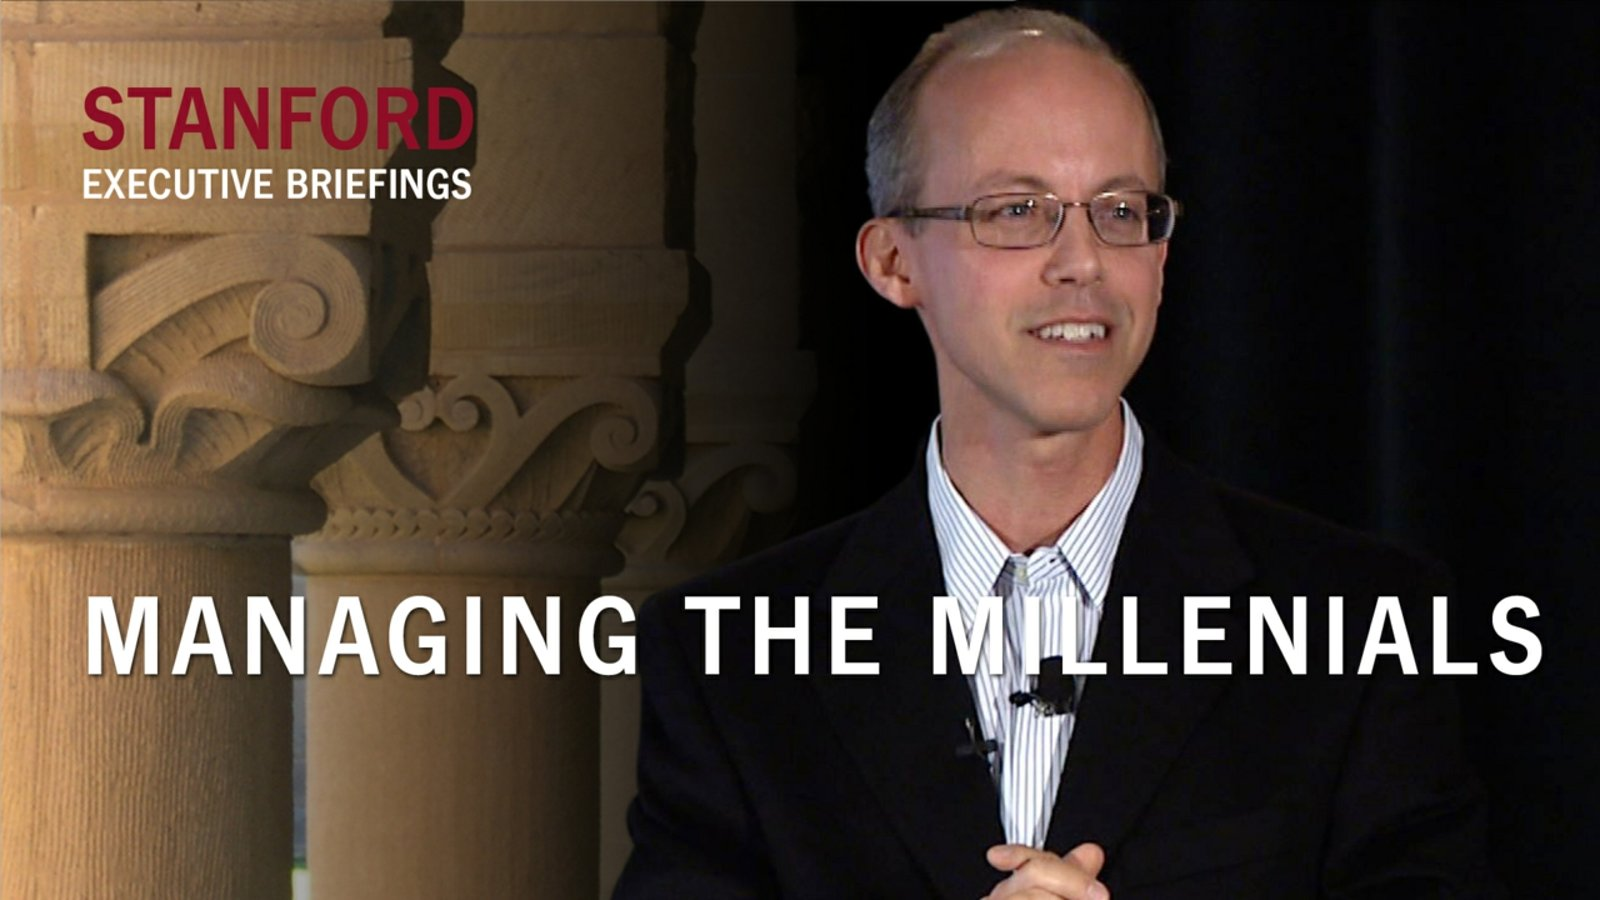 Managing Millennials - With Alec Levenson